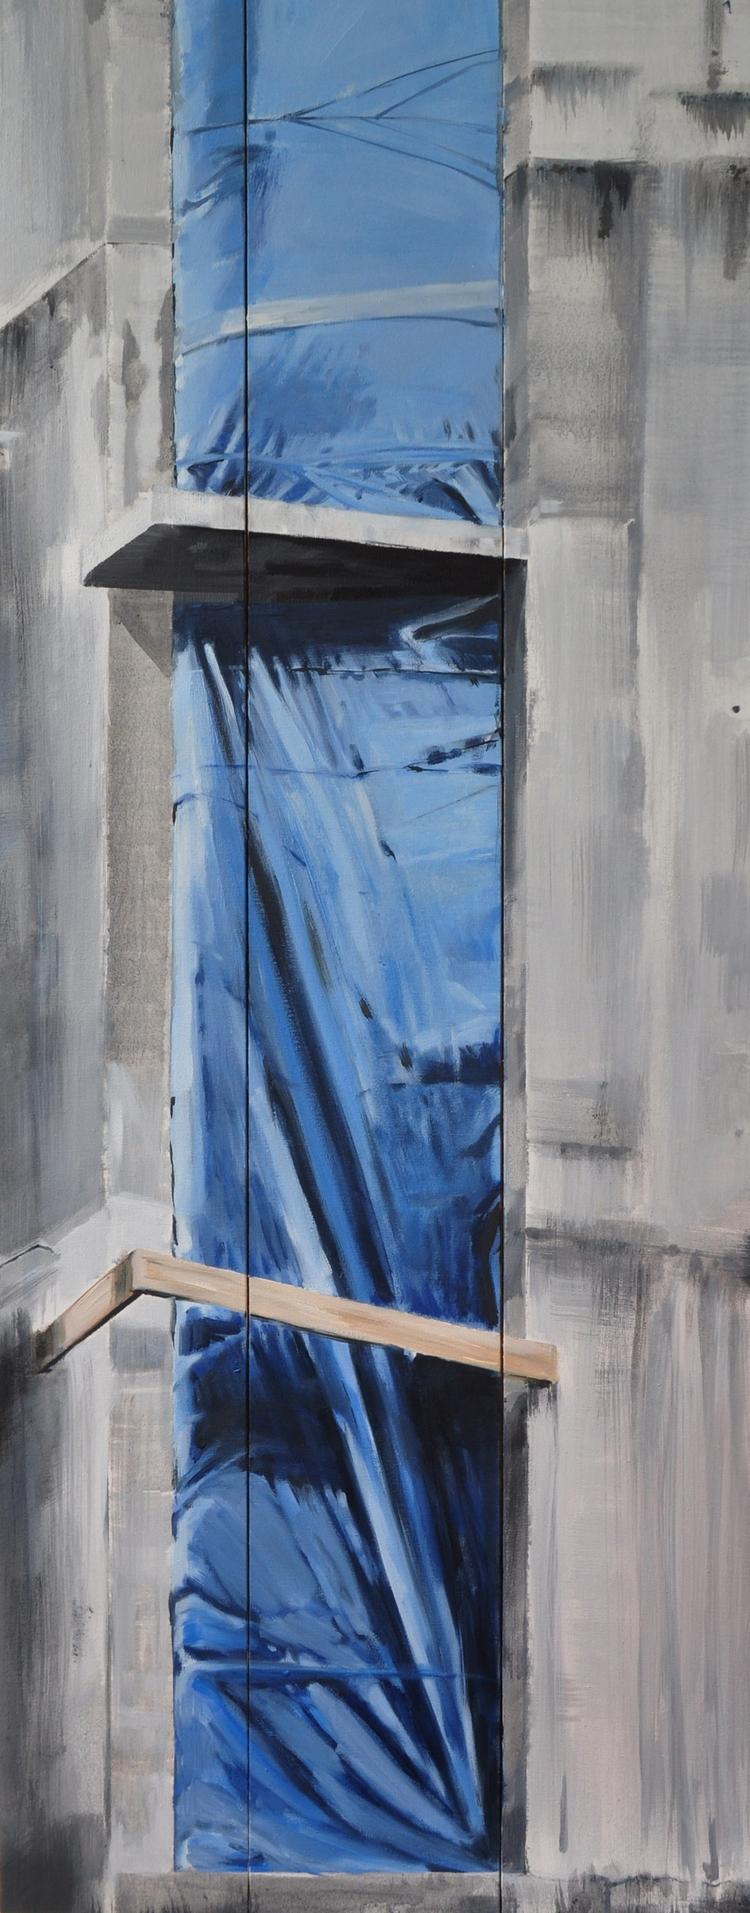 100x39,5cm, building# artist ju - judytakrawczyk   ello